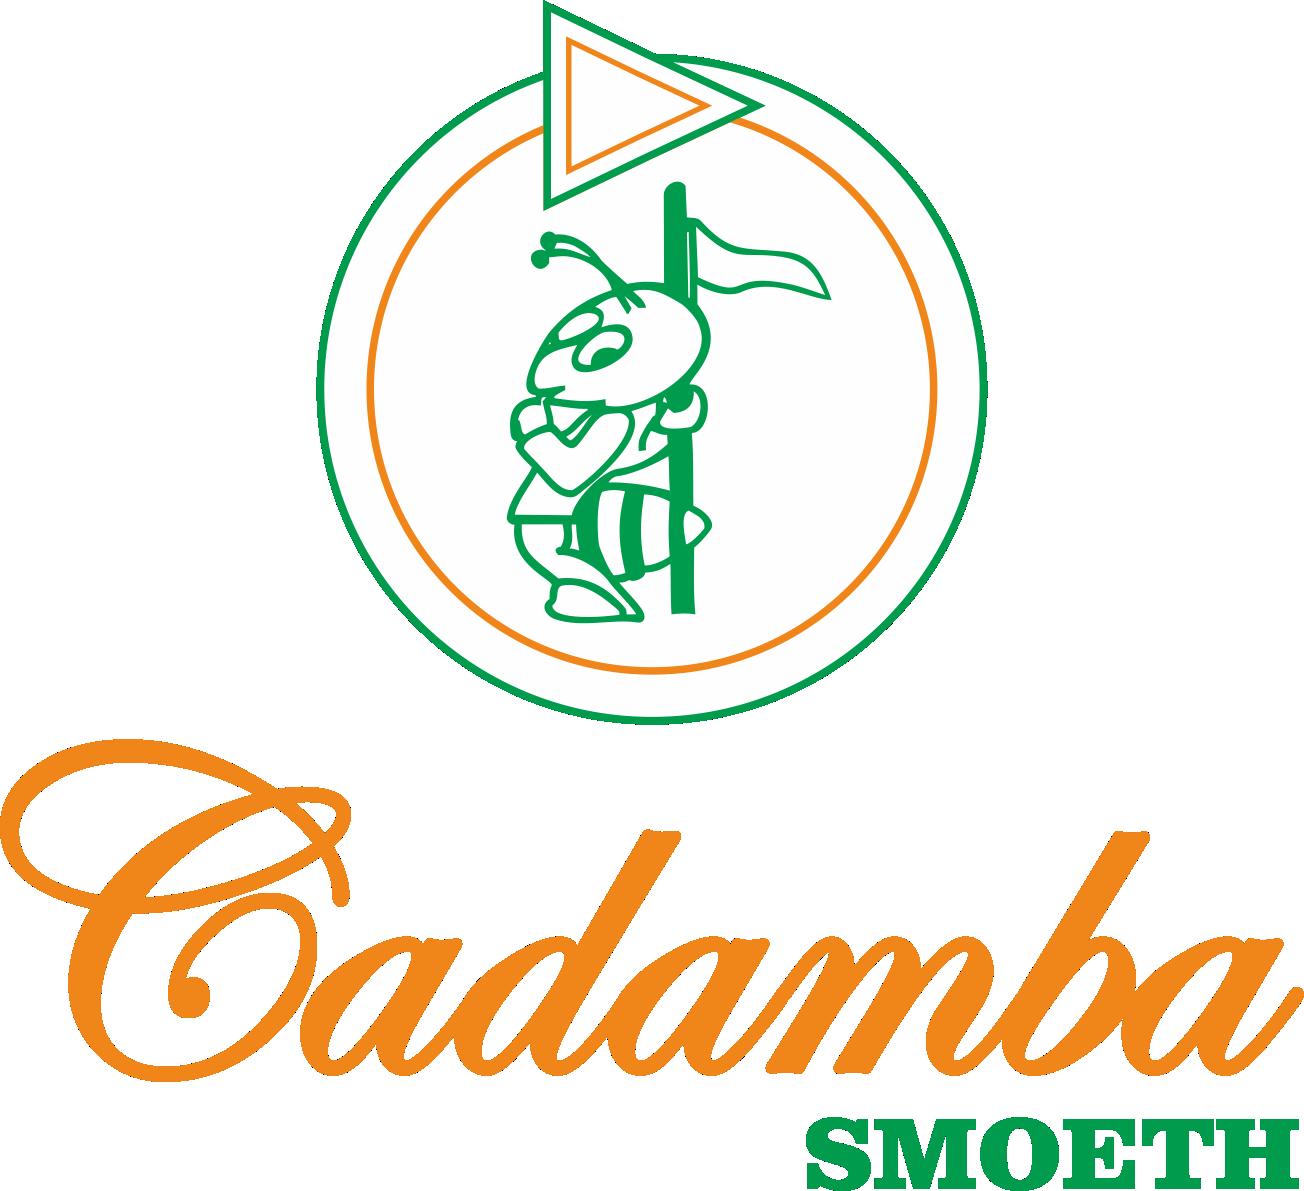 CADAMBA logo